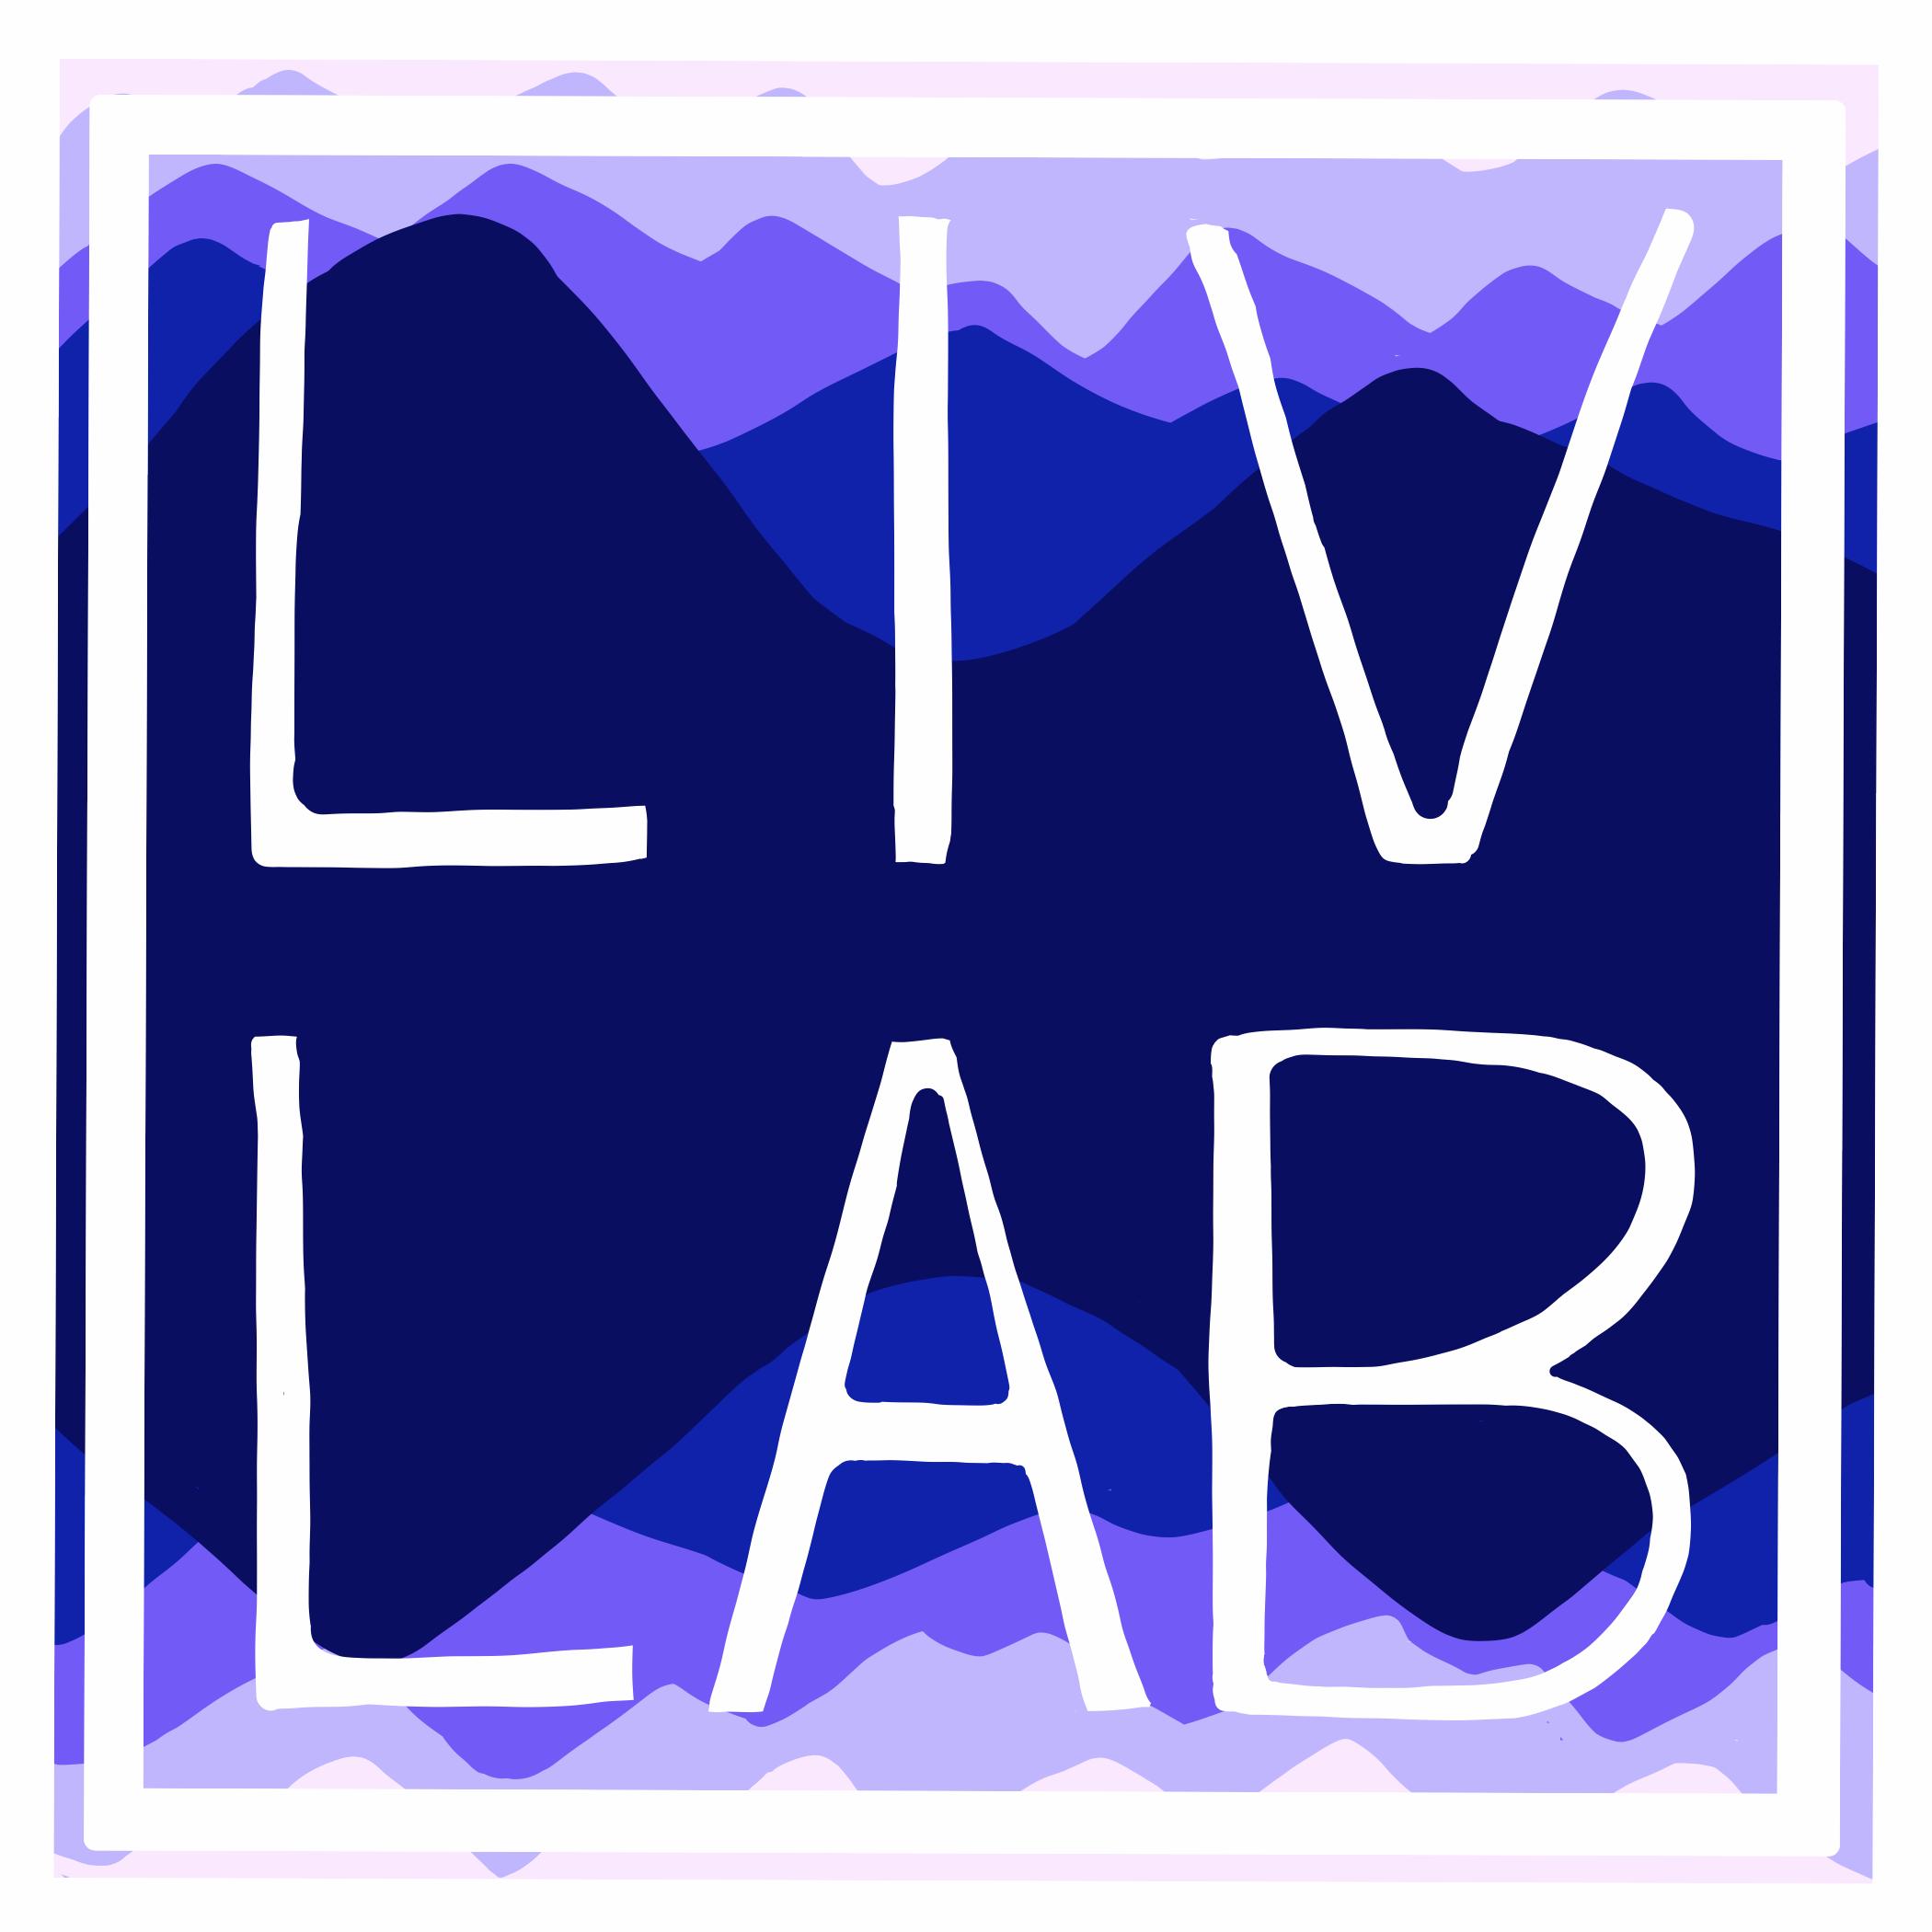 livlab-logo.PNG